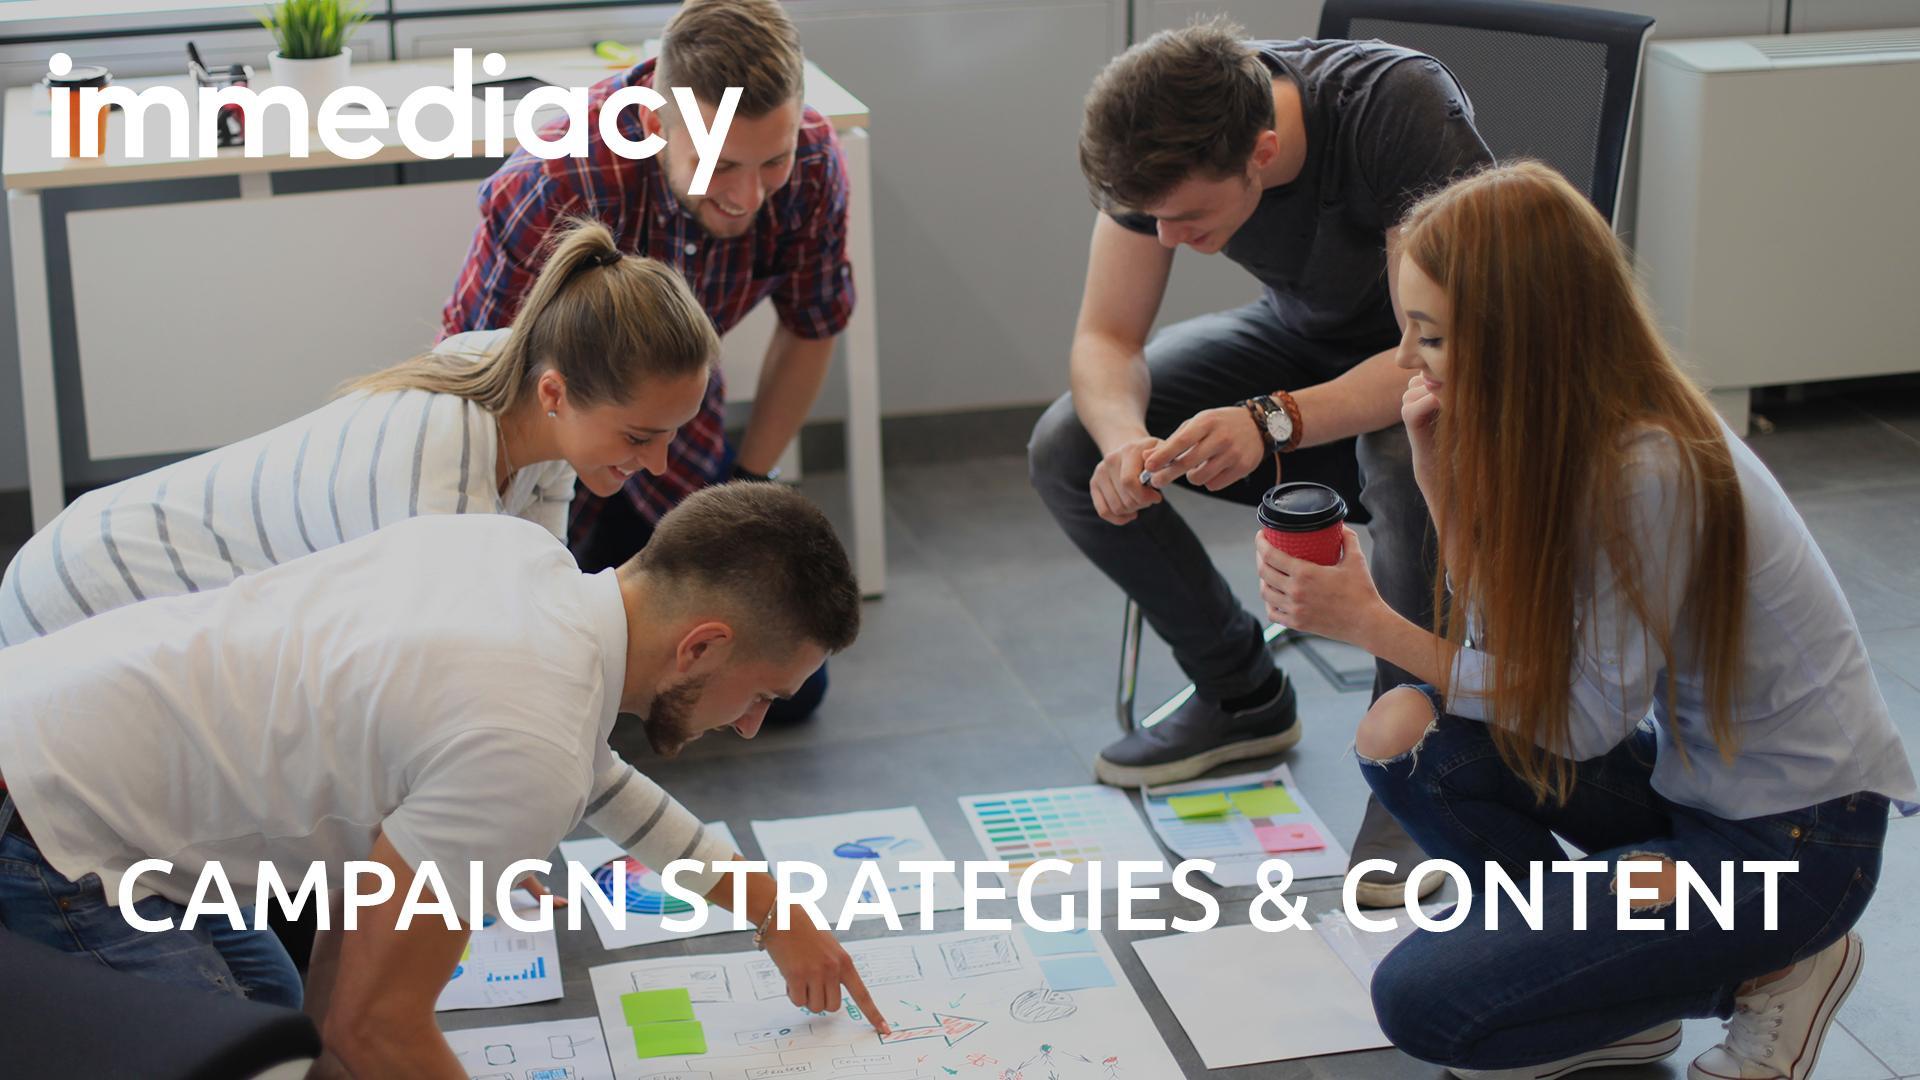 Social Media Campaign Strategies Workshop